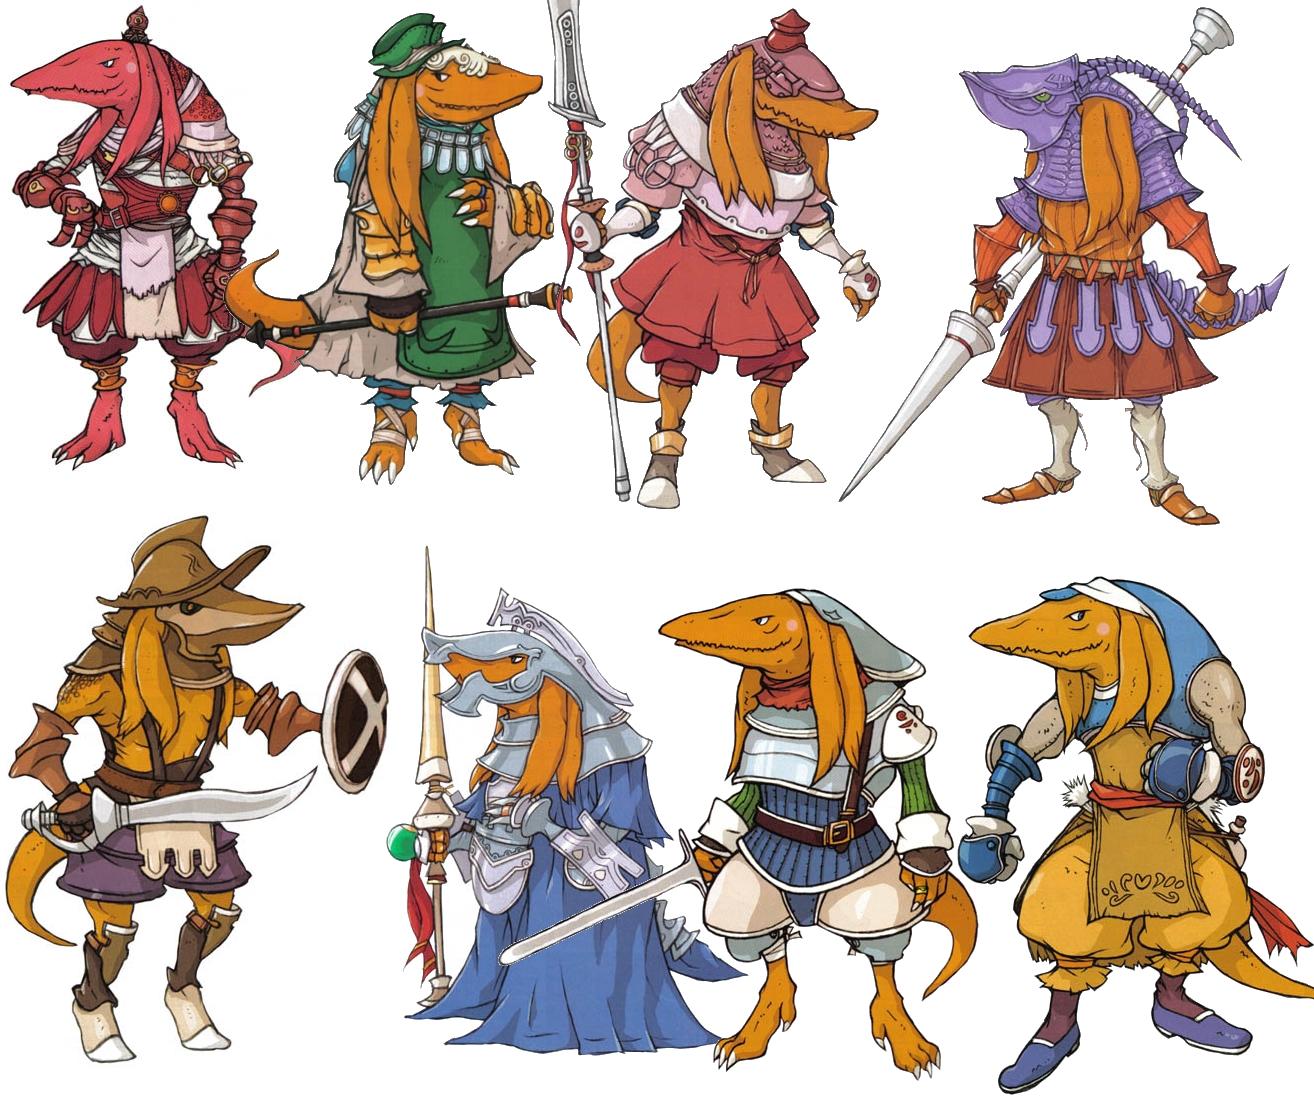 Final Fantasy Tactics Advance Wallpapers Video Game Hq Final Fantasy Tactics Advance Pictures 4k Wallpapers 2019